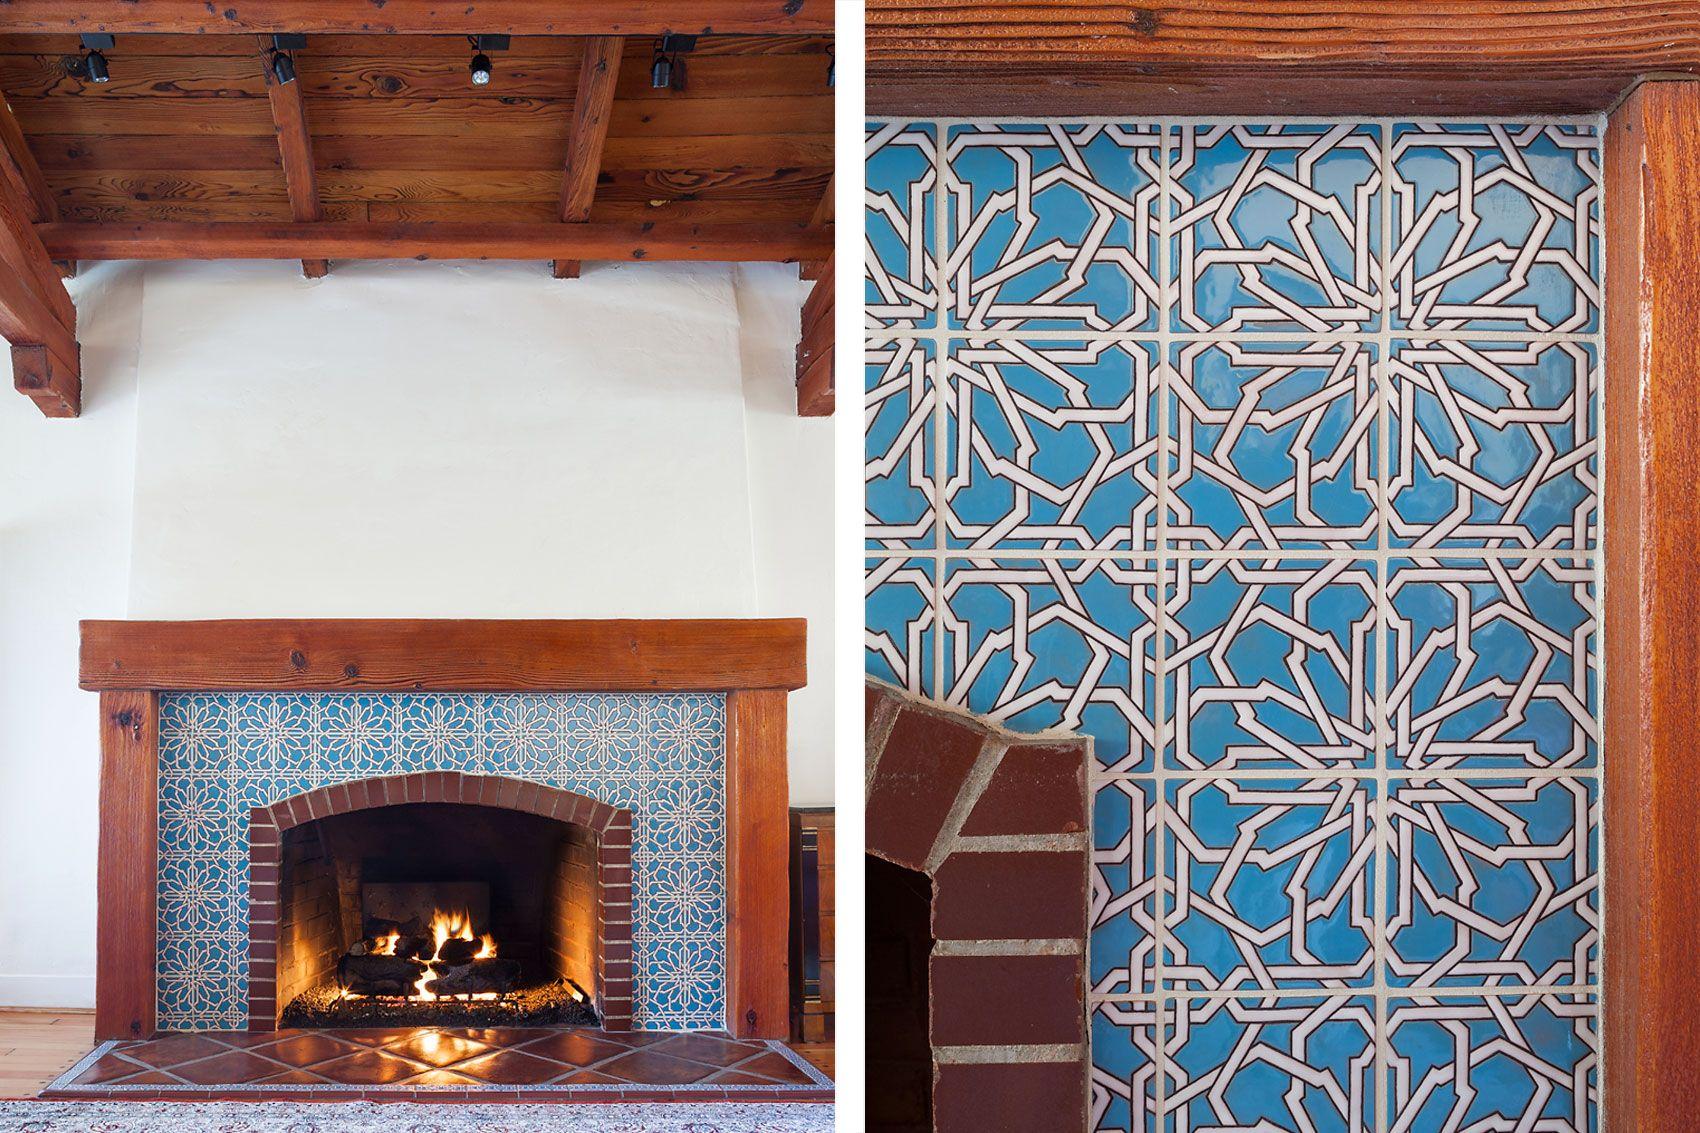 Dorable Ative Tile Collection - Bathtub Ideas - dilata.info